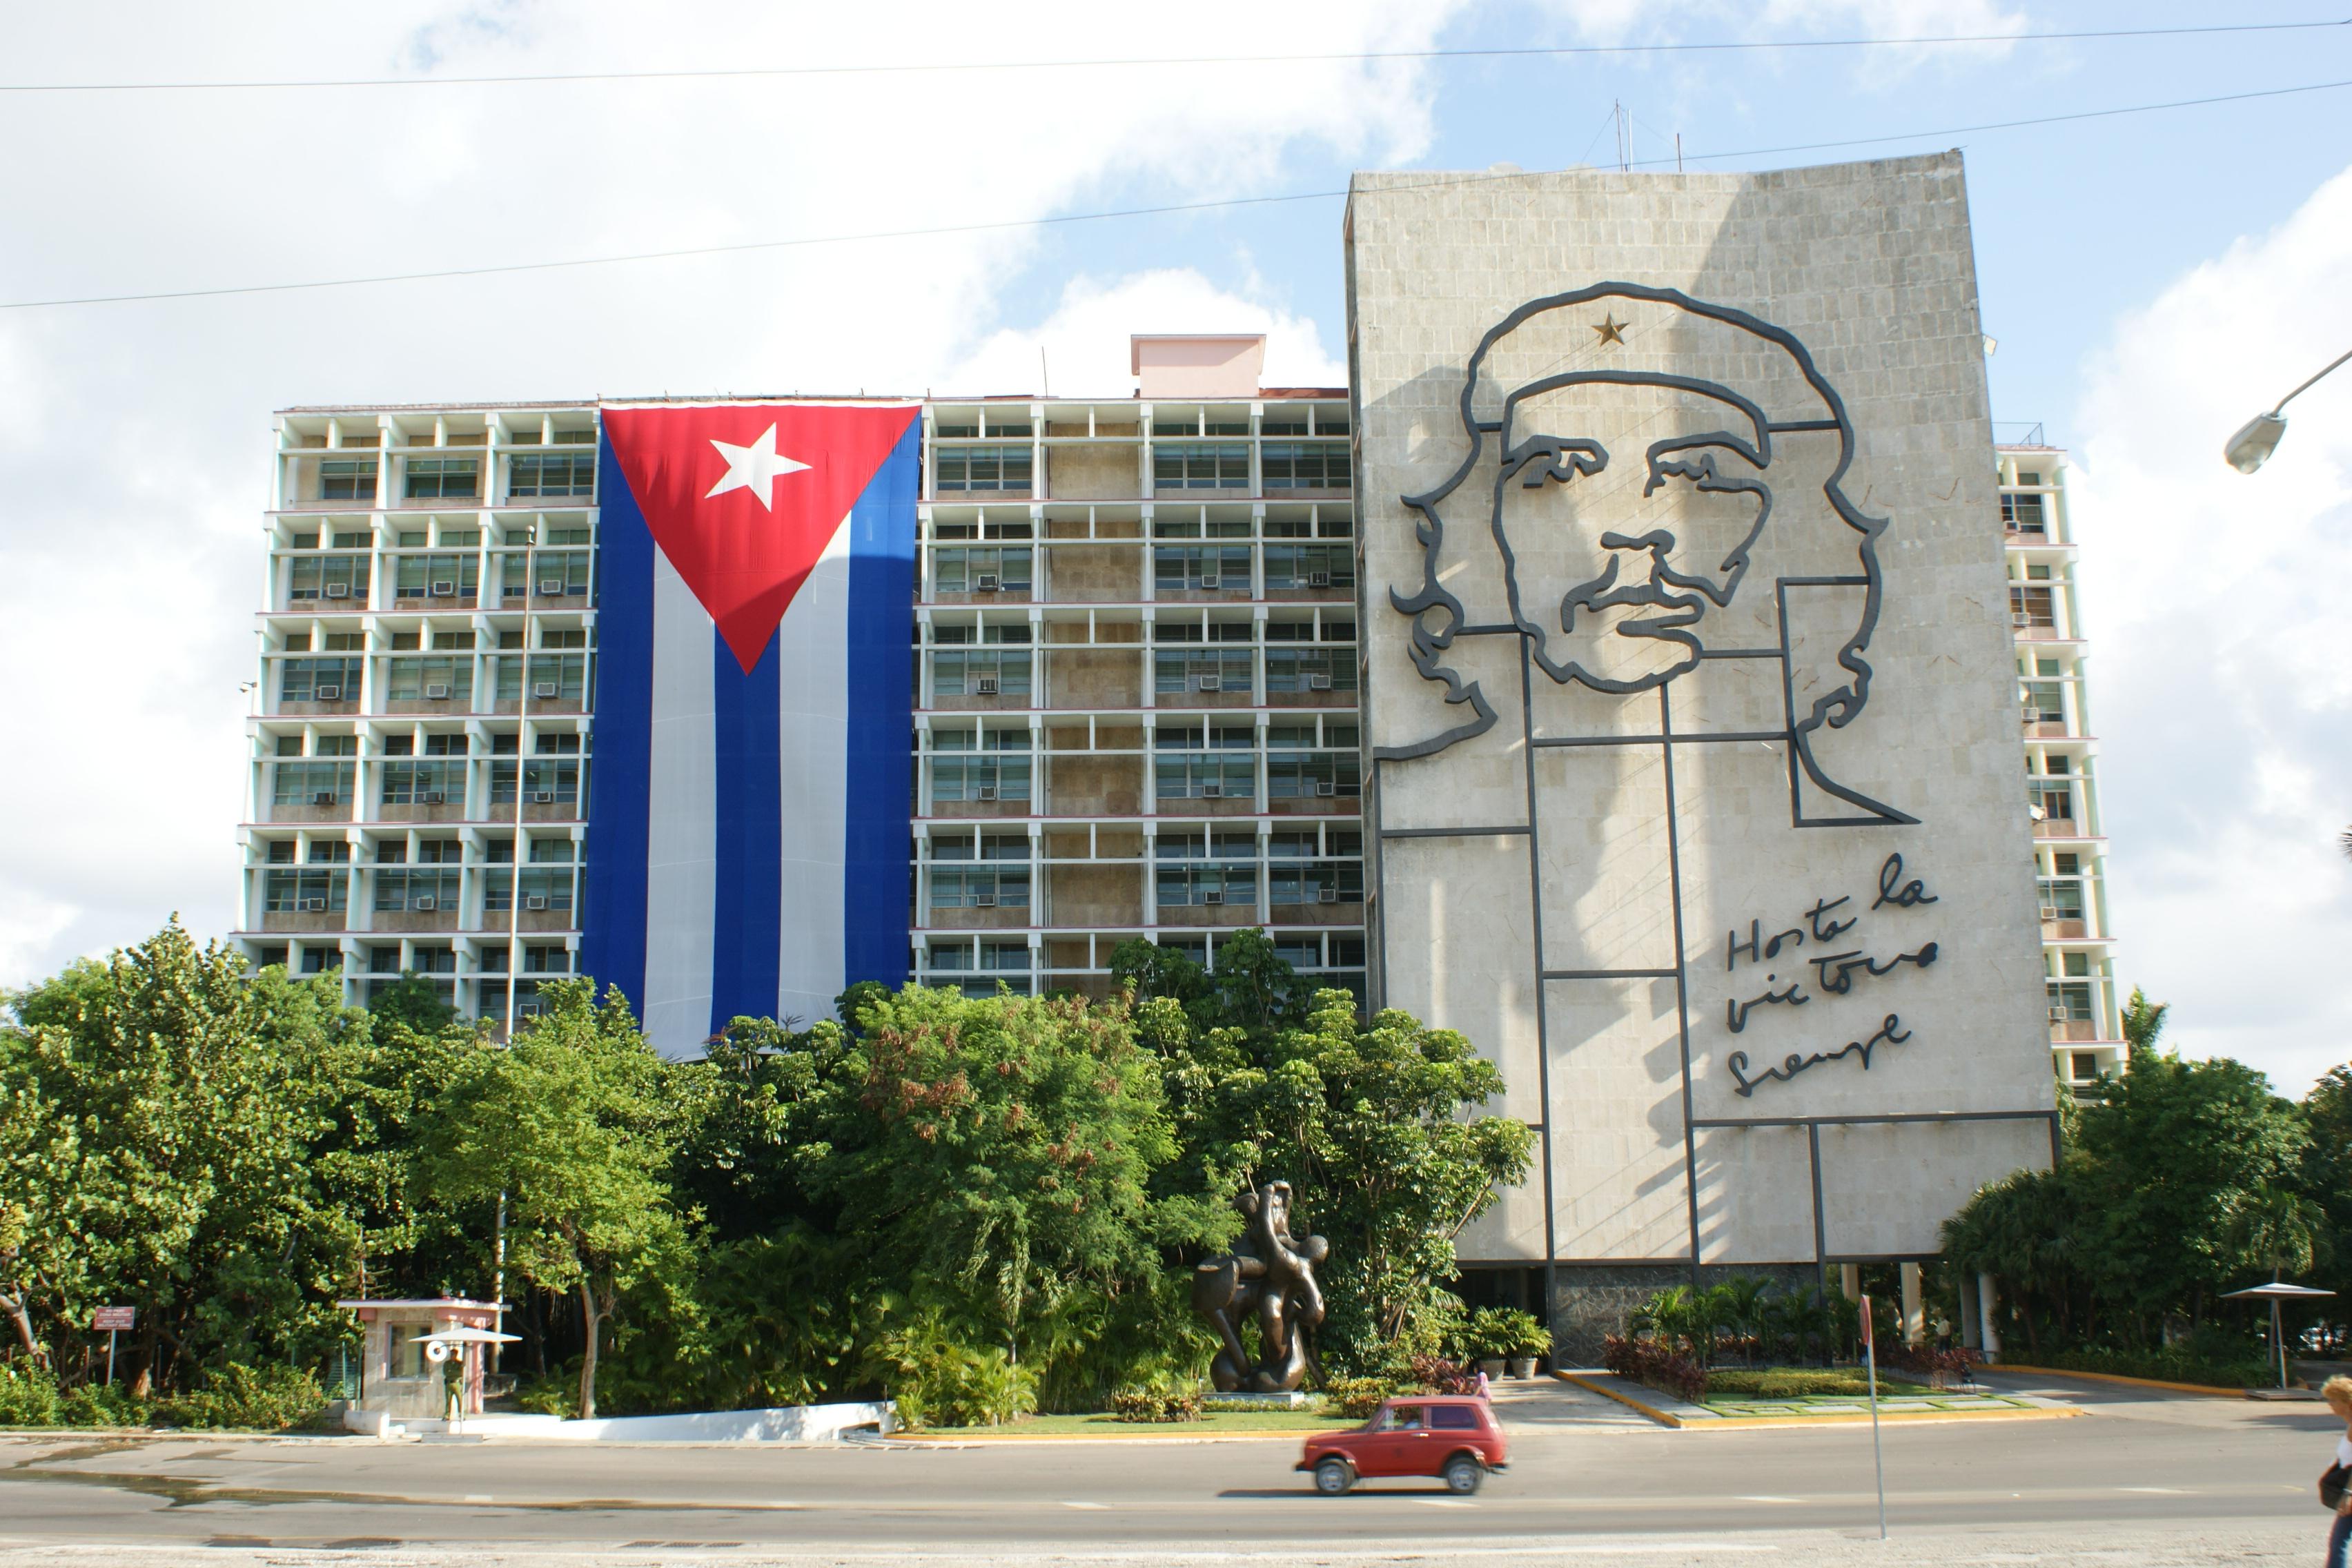 Proteste a Cuba, ecco cosa sta succedendo